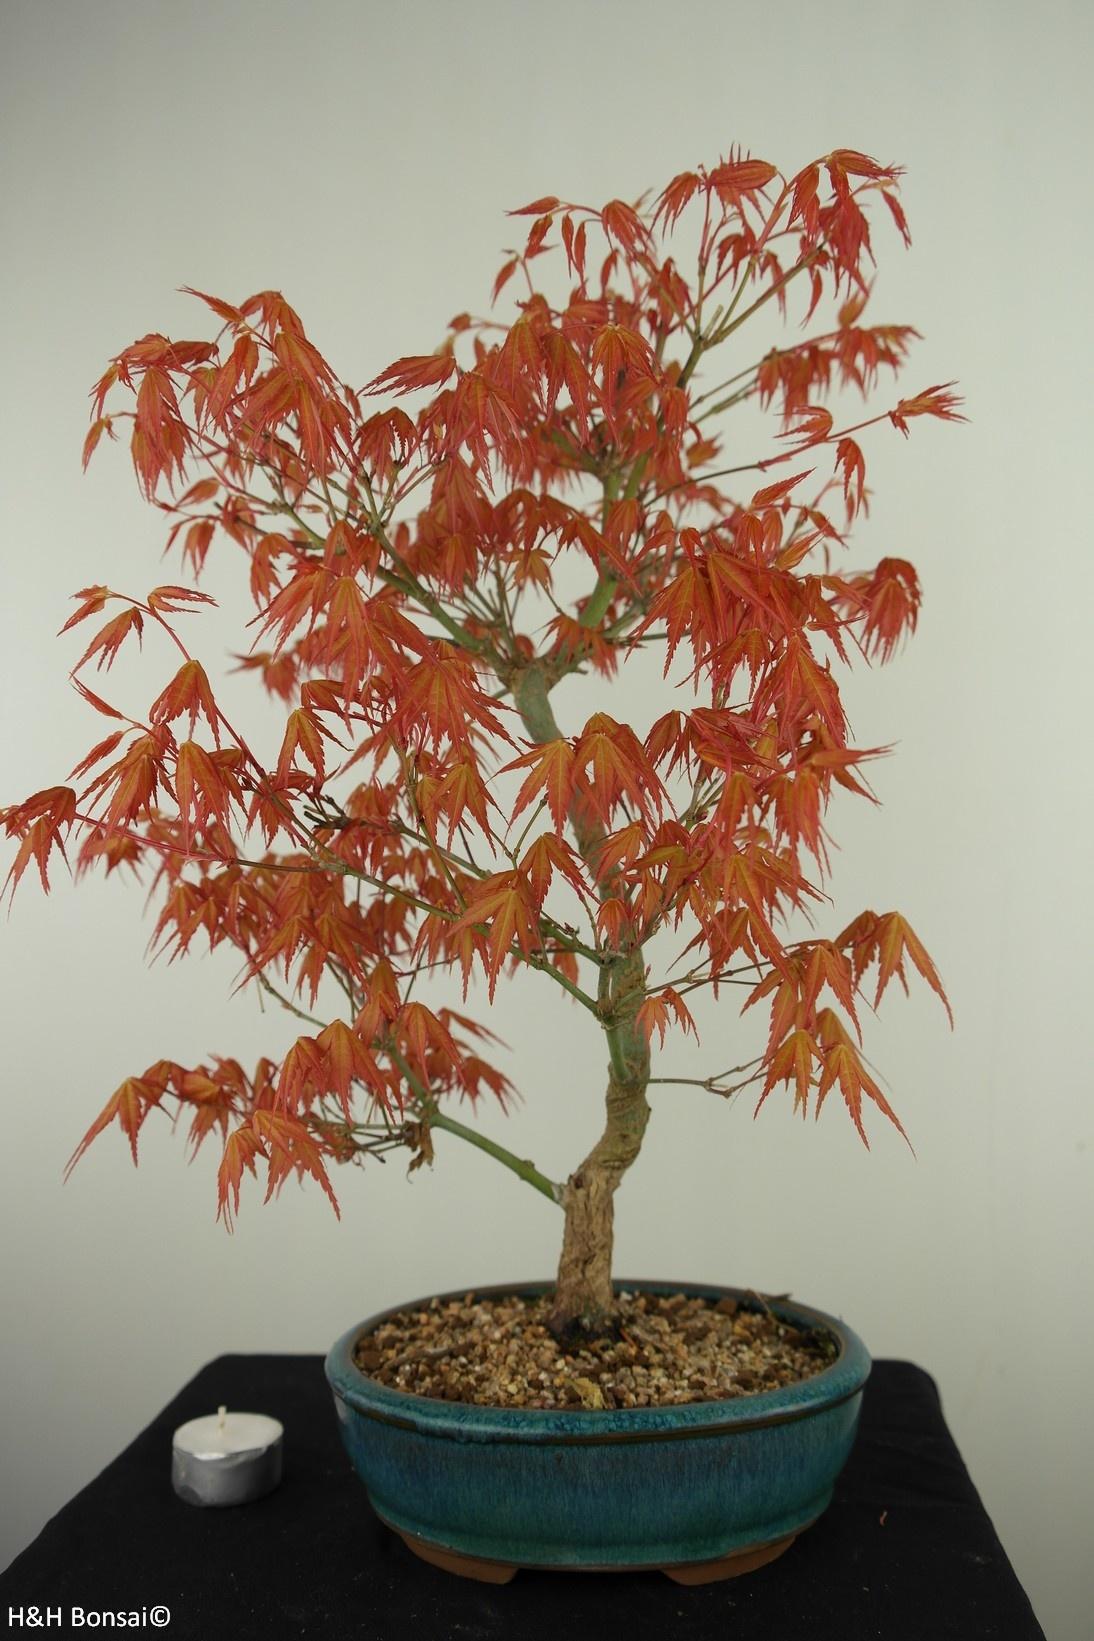 Bonsai Japanese Maple Katsura, Acer palmatum Katsura, no. 7672